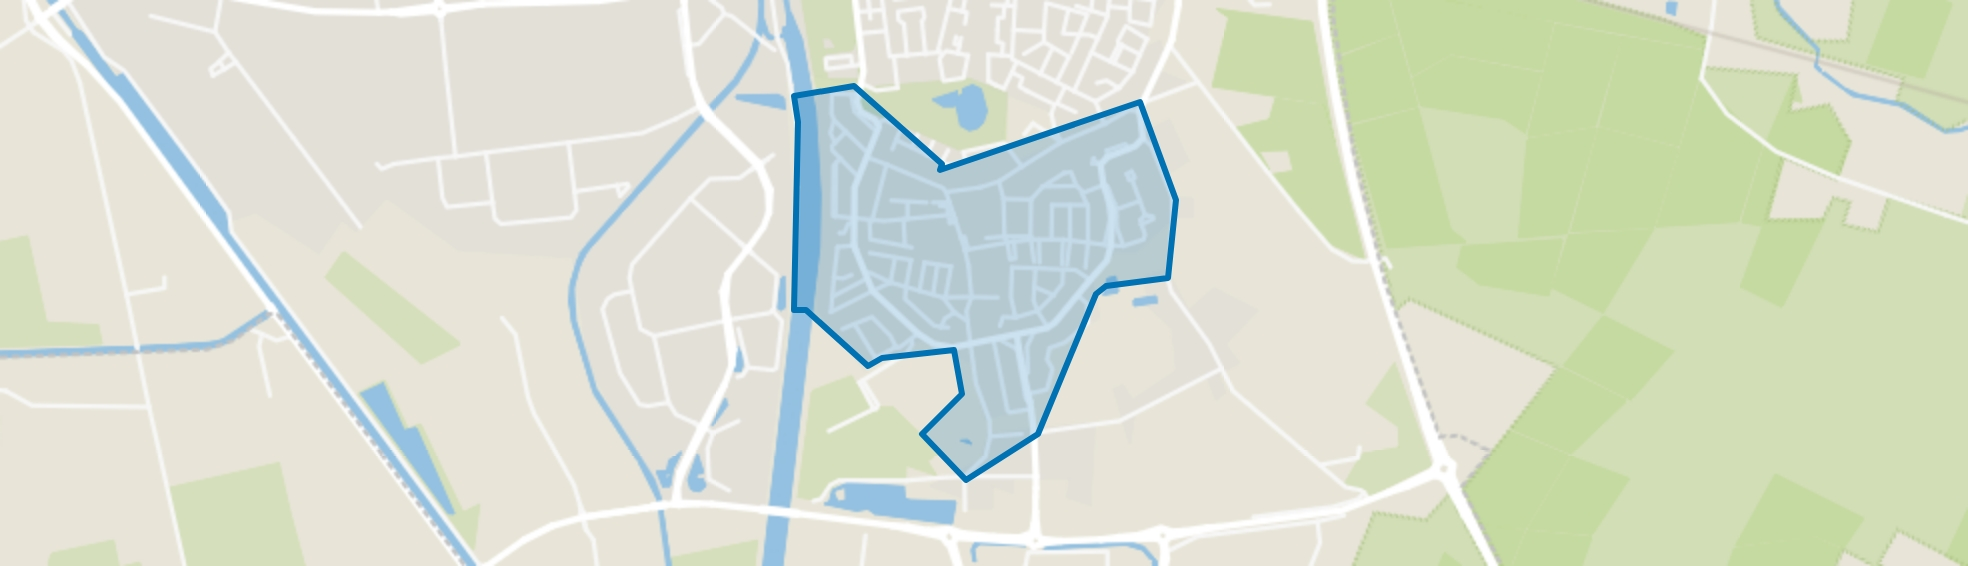 Brouwhuis-Dorp, Helmond map